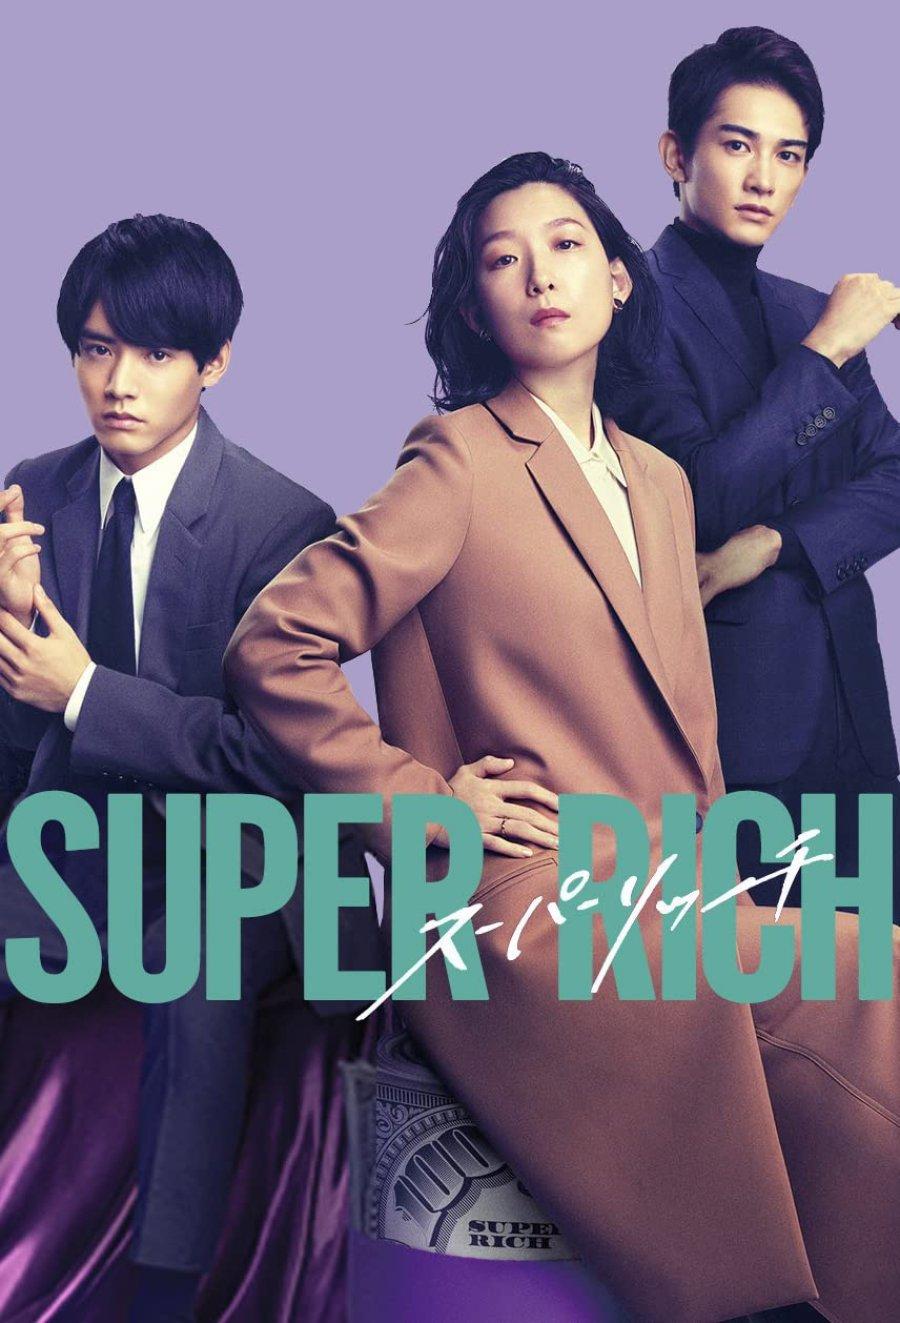 SUPER RICH (2021)